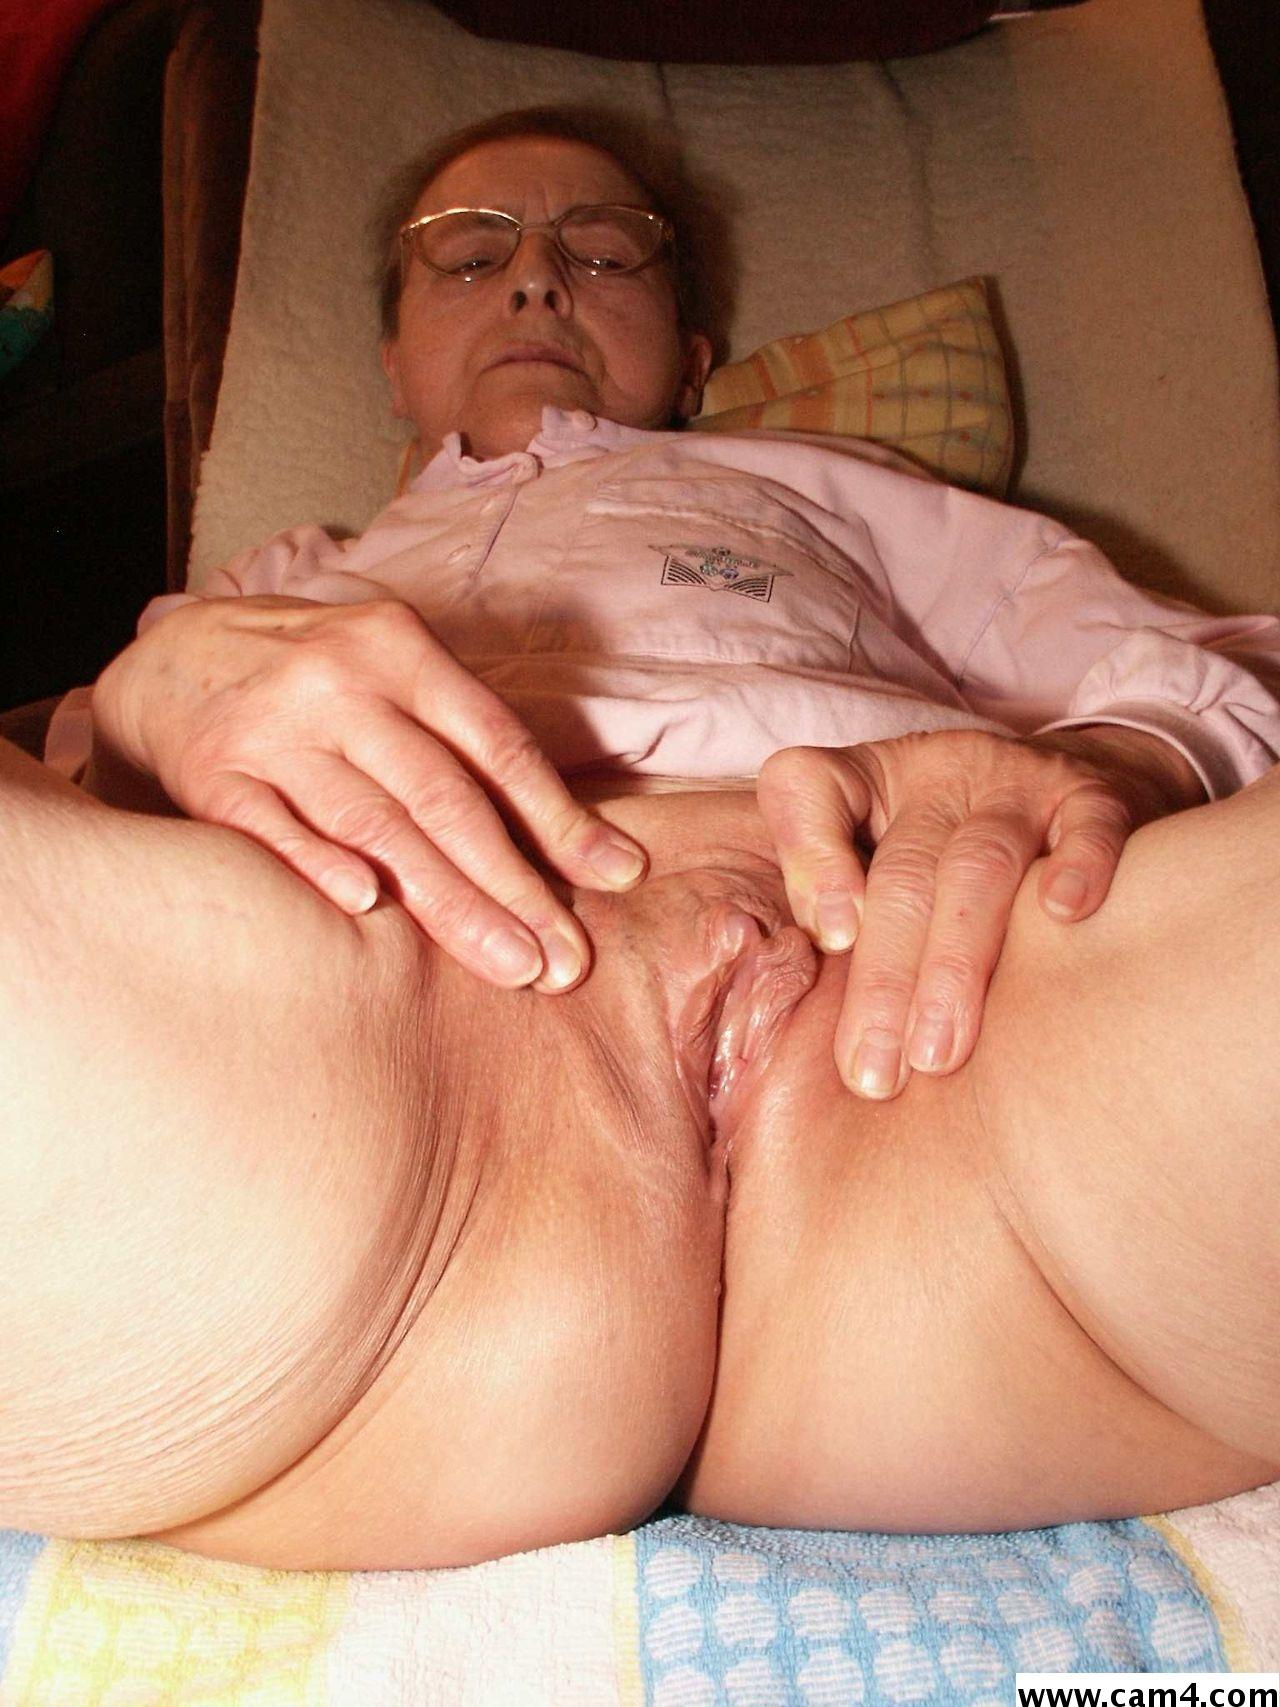 Fingering fat pussy